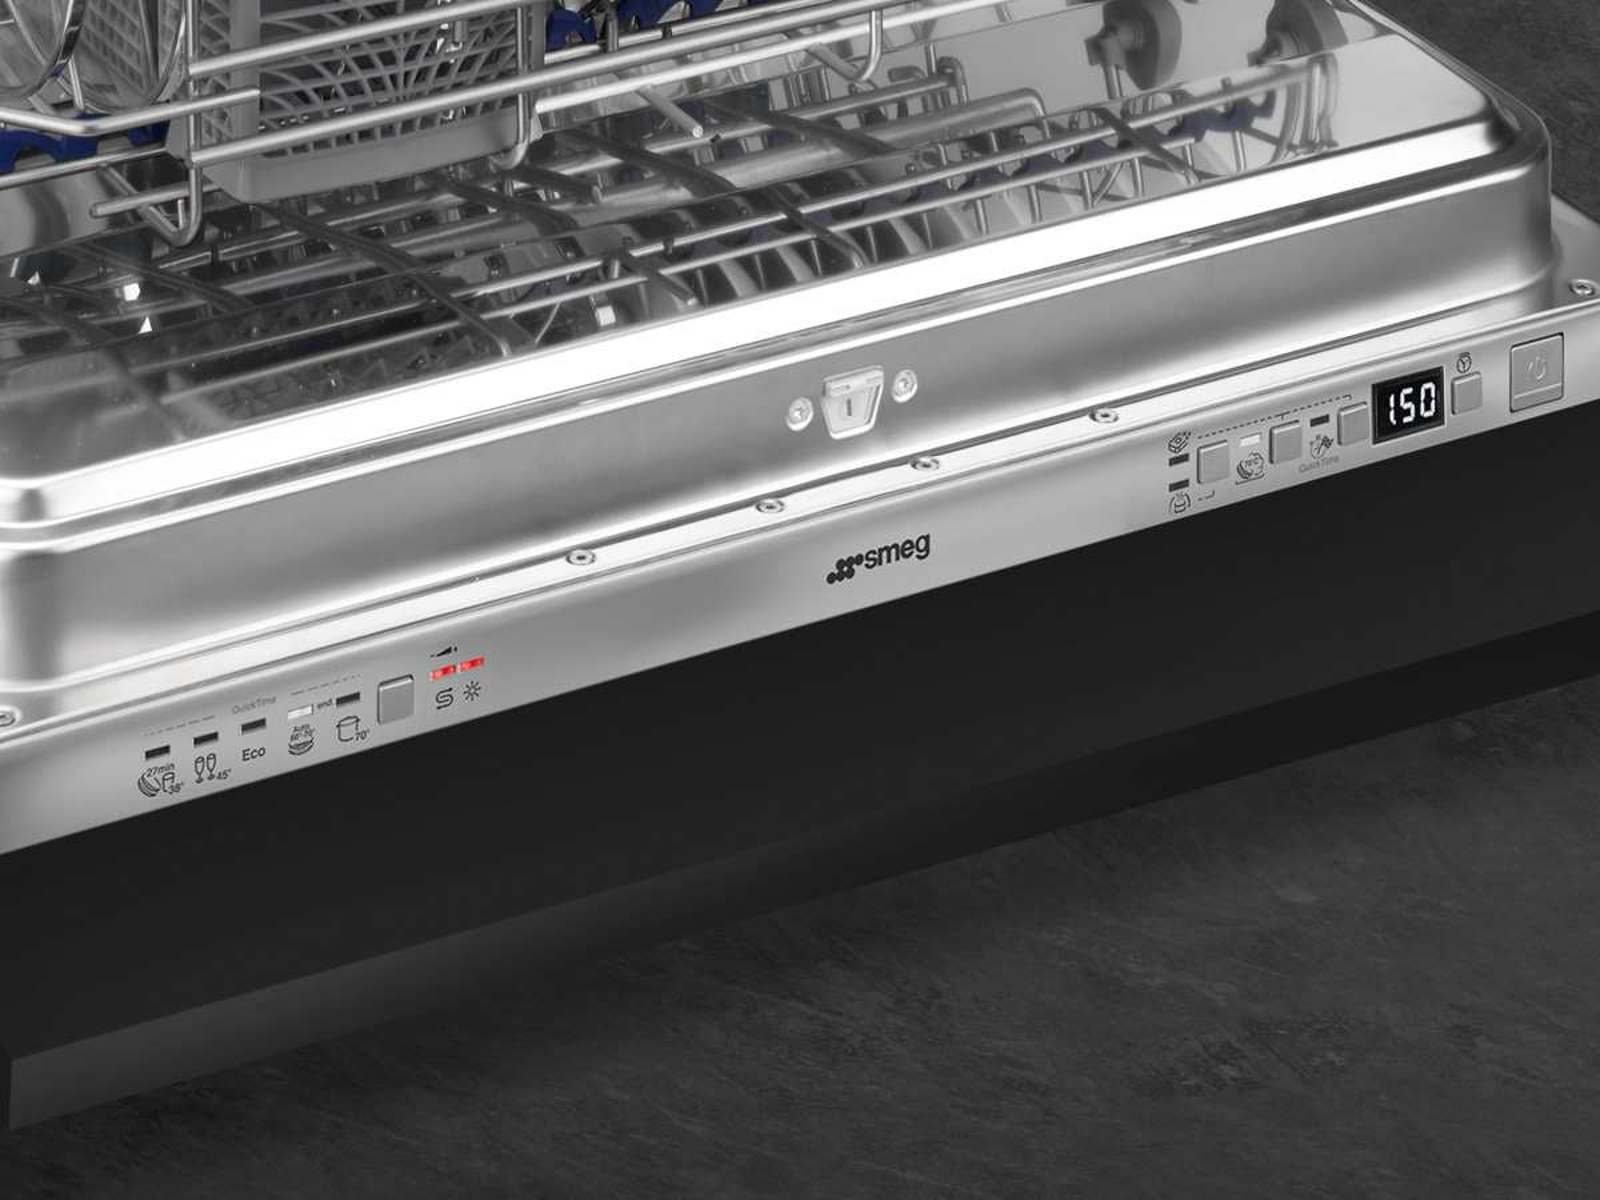 Smeg Kühlschrank Xxl : Smeg ste l vollintegrierbarer einbaugeschirrspüler xxl